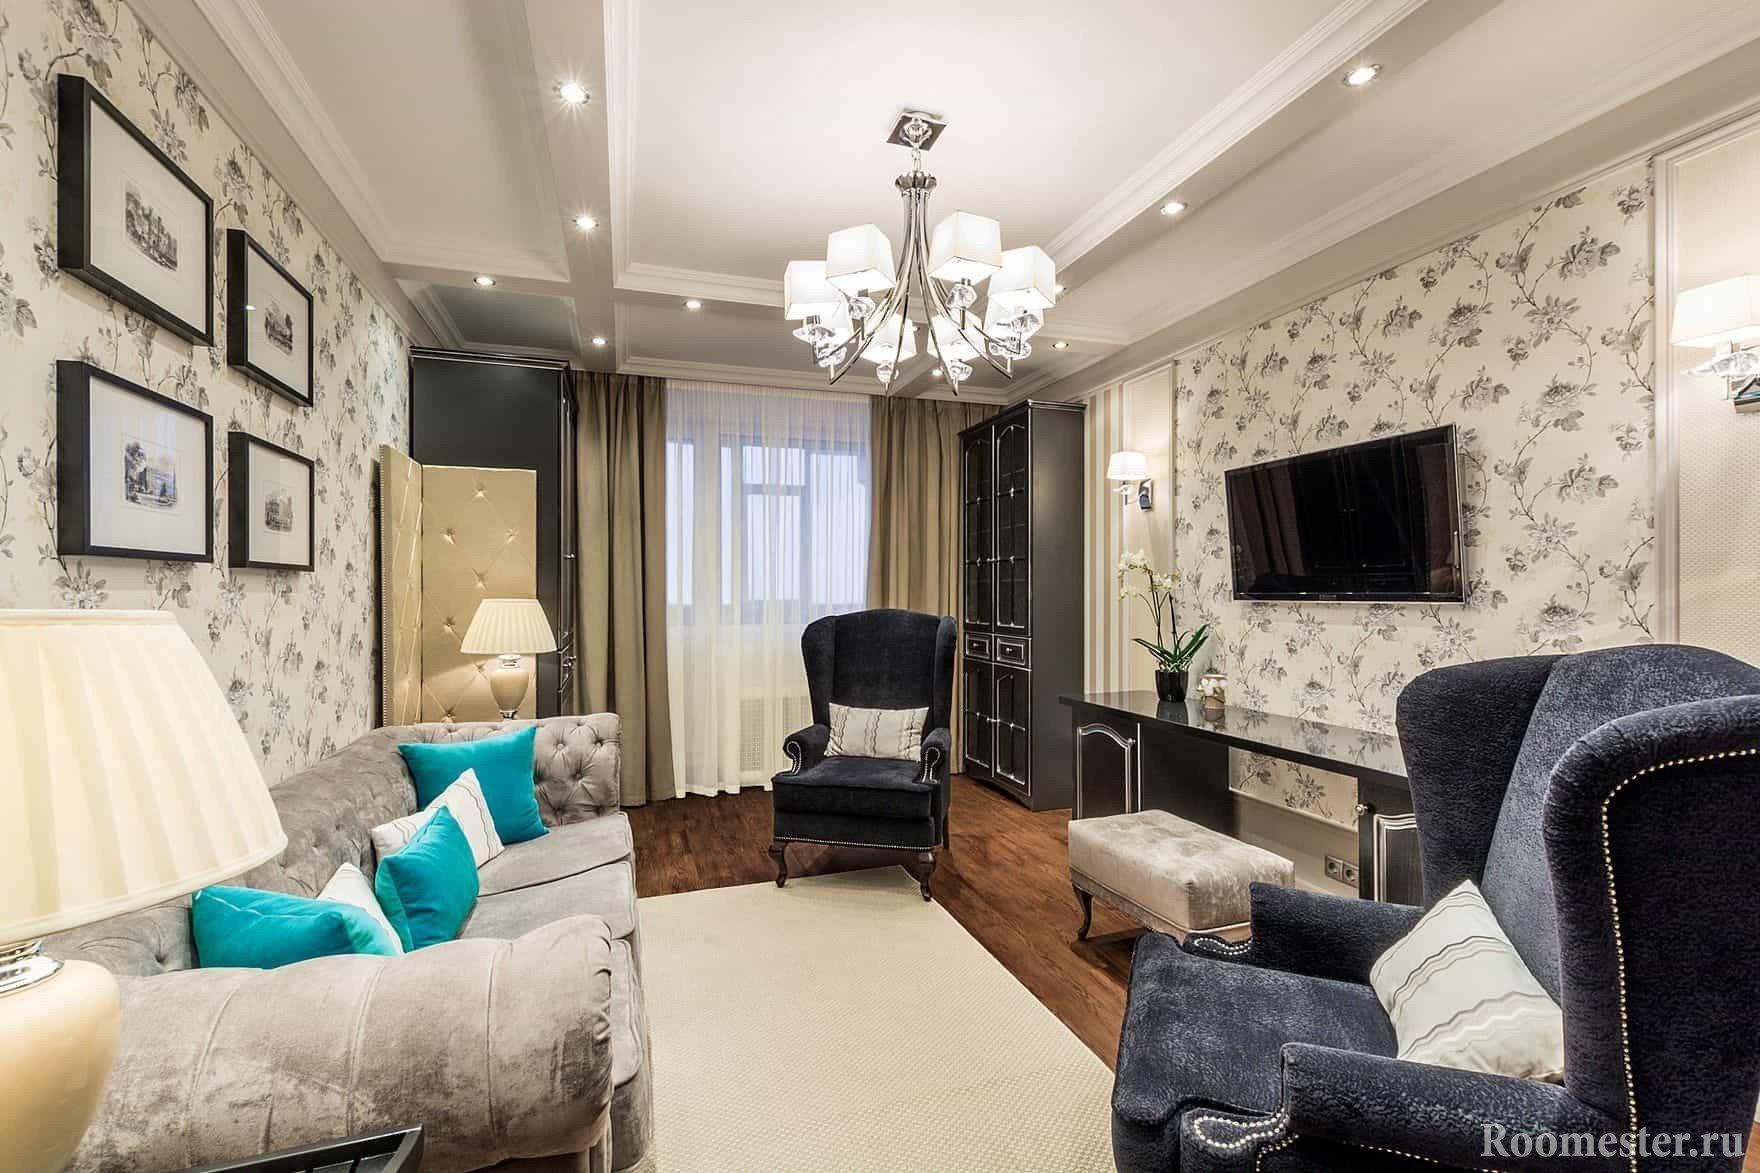 Expensive living room interior design